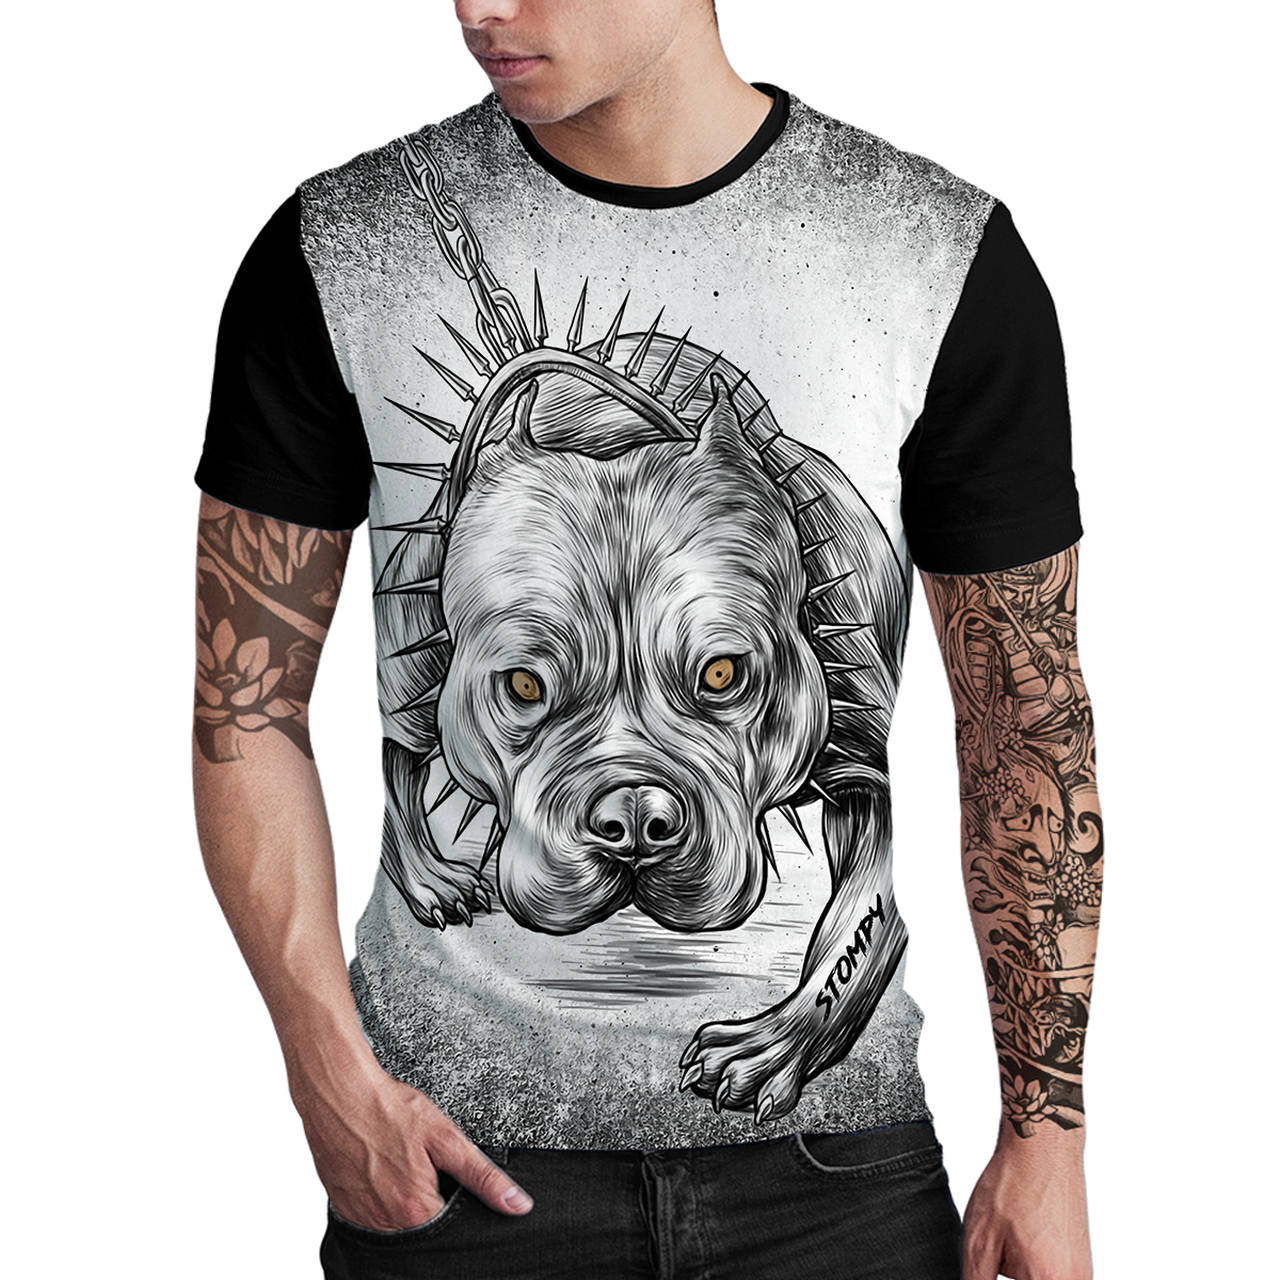 Stompy Camiseta Estampada Masculina Modelo 82